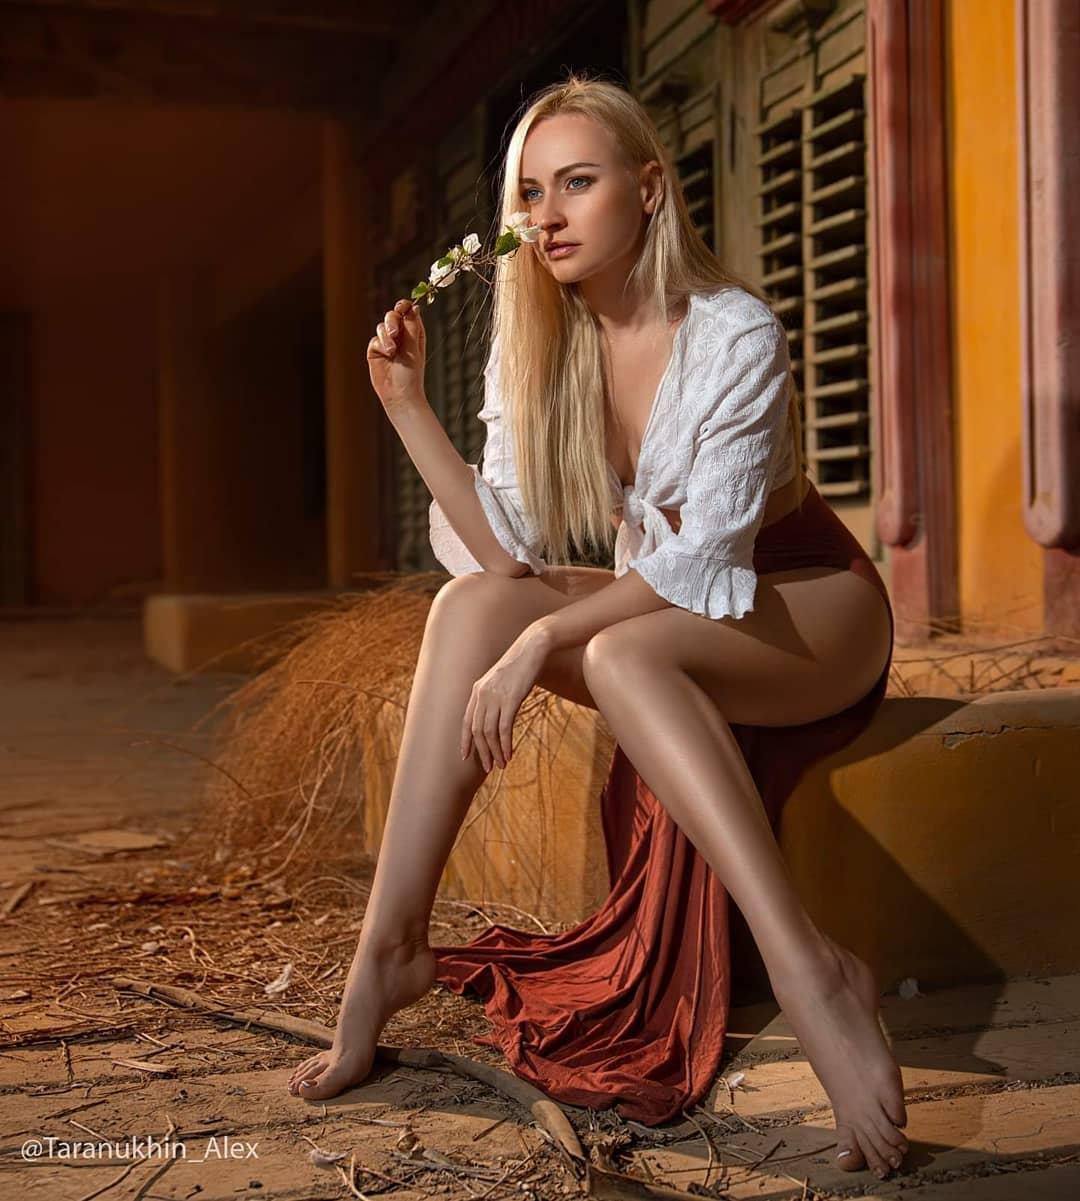 evgenia_taranukhina's_sexy_feets_on_instagram_4